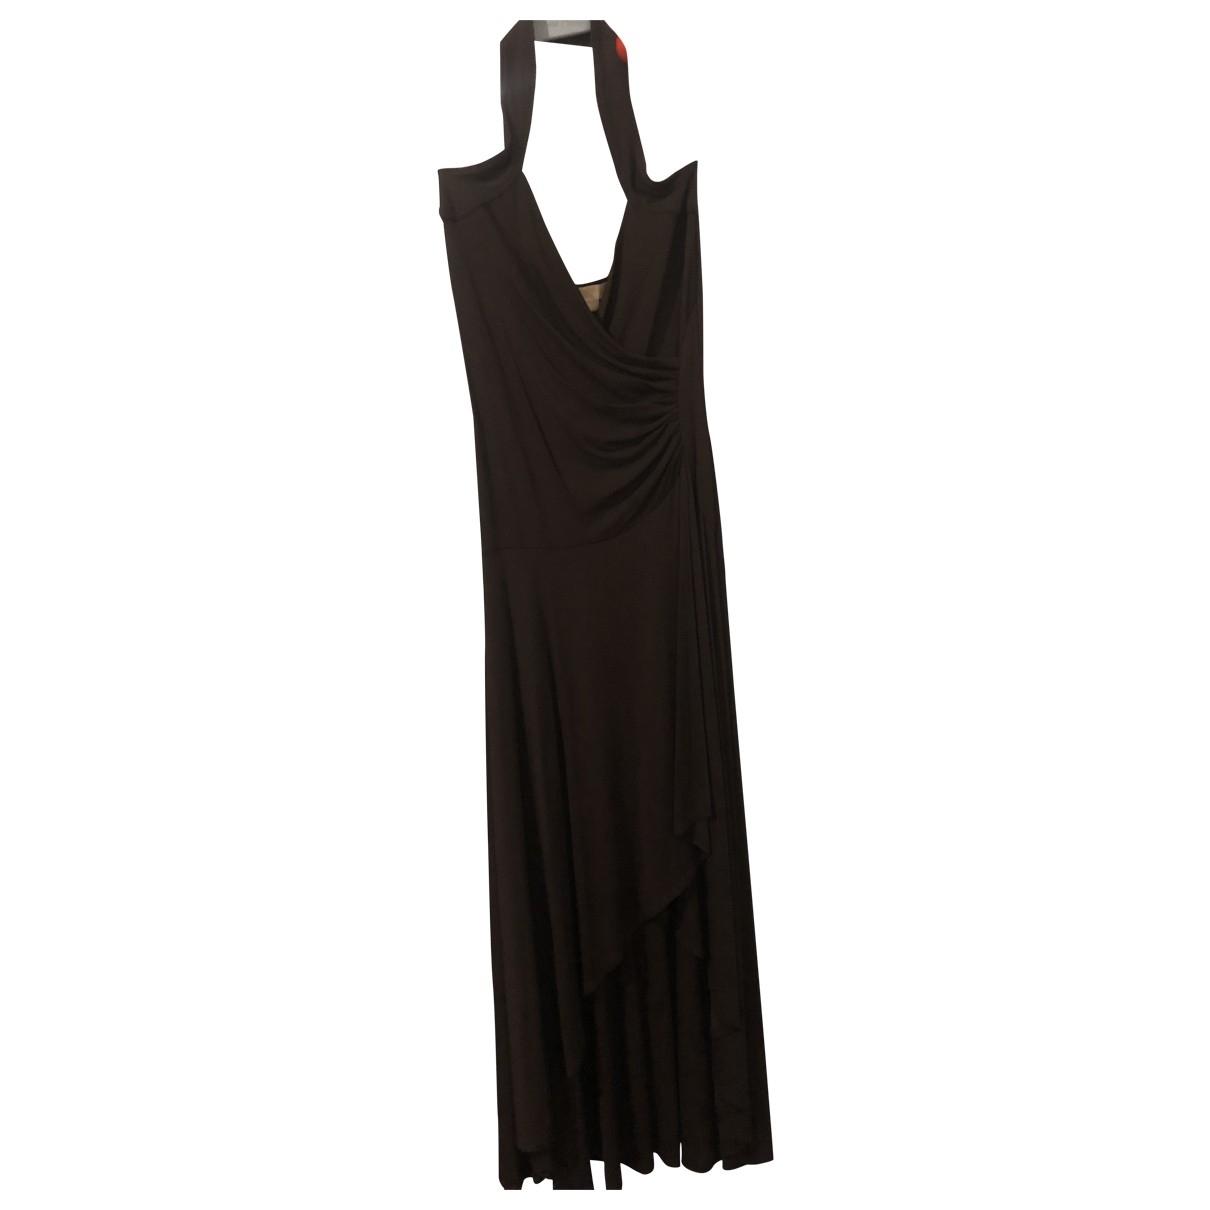 Michael Kors \N Brown Silk dress for Women 2 US